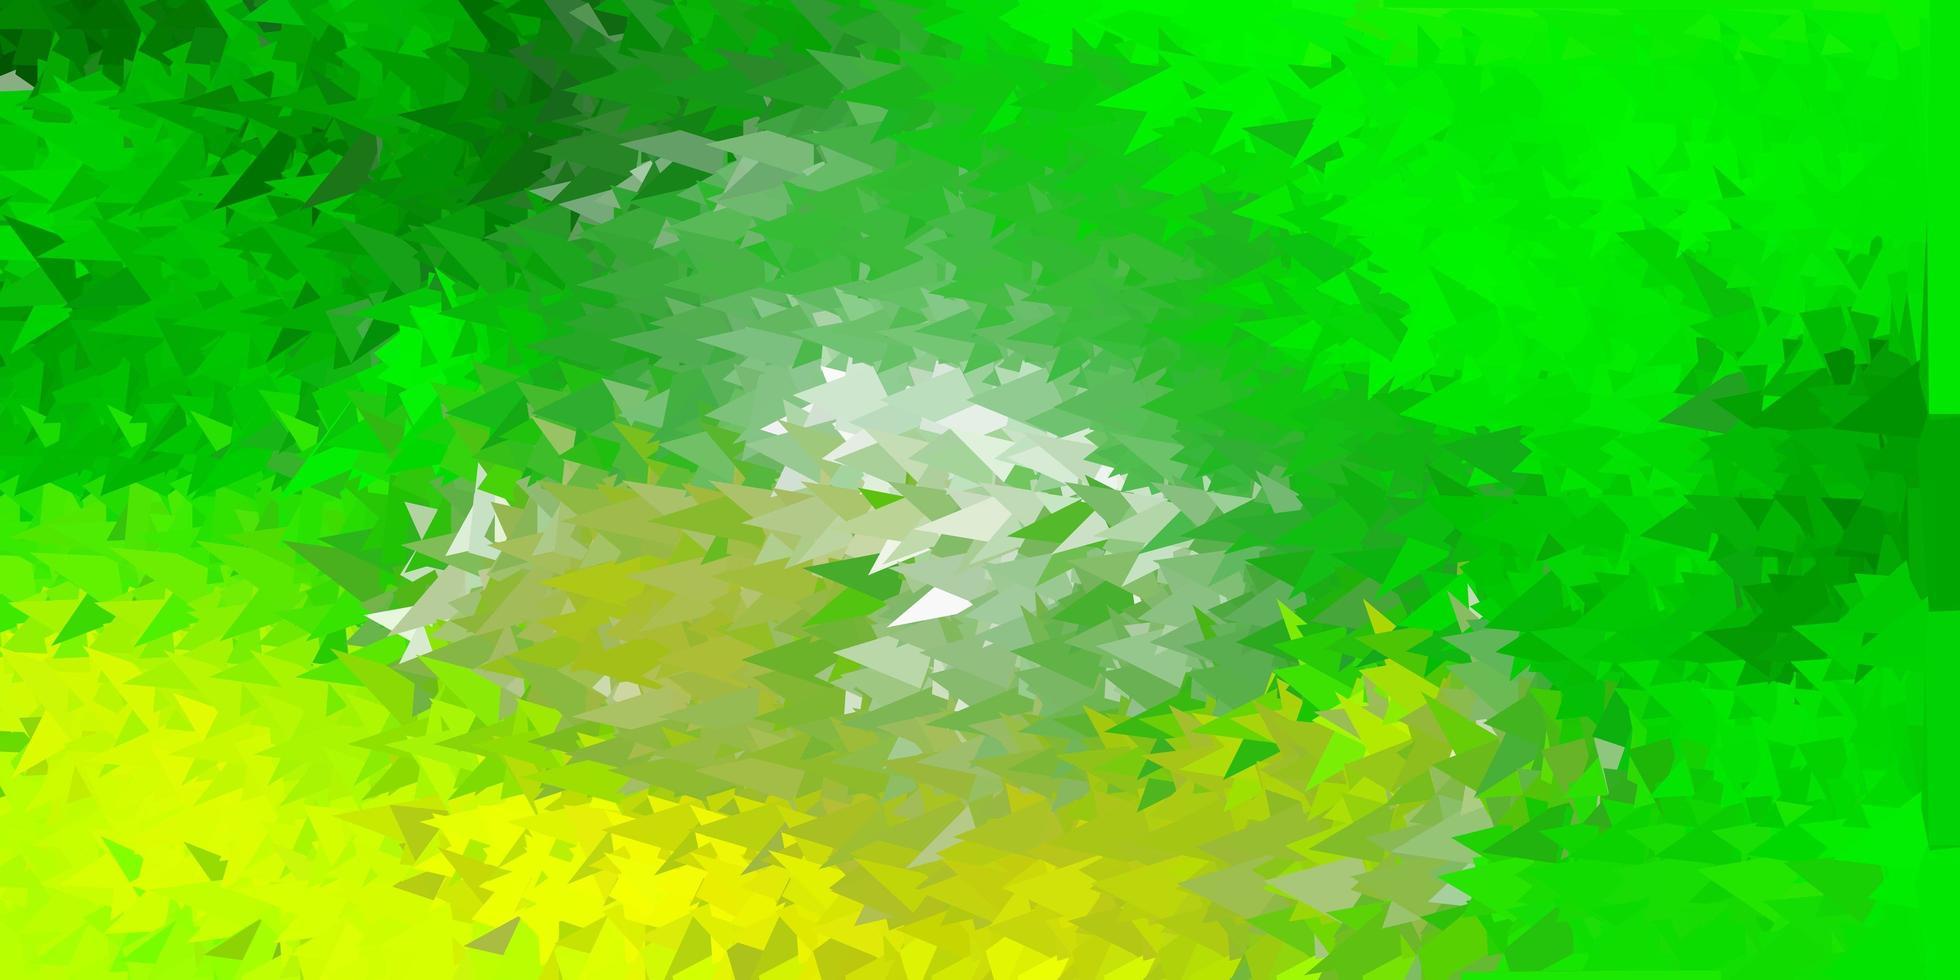 papel de parede de mosaico de triângulo de vetor verde claro e amarelo.